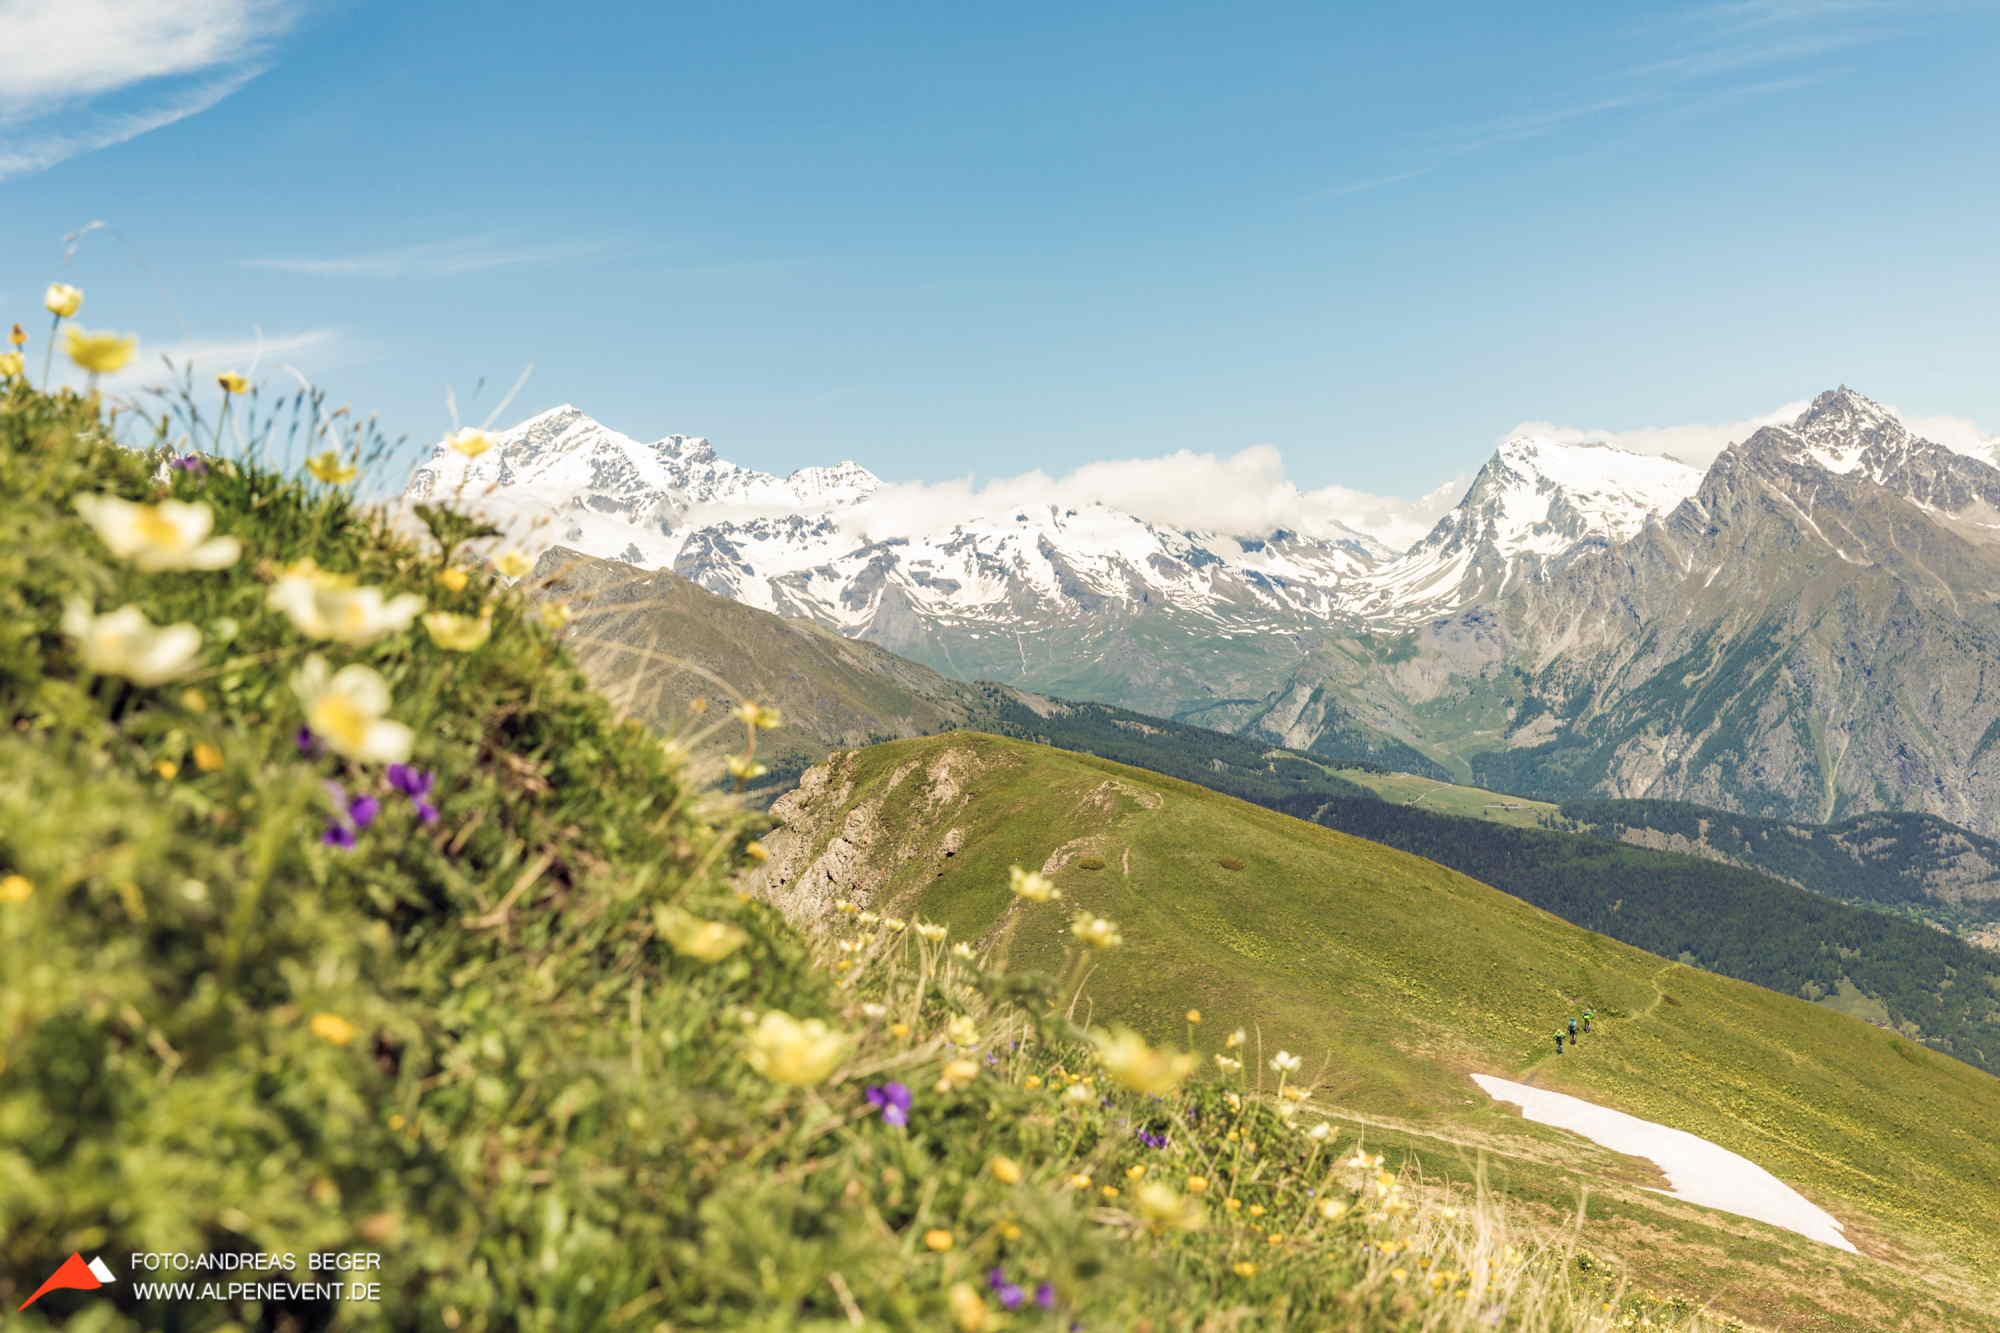 Ride Alpine Trails Mountainbike Freeride & Enduro Camp MTB Enduro Camp Individuelle Tourenbplanung Ride on